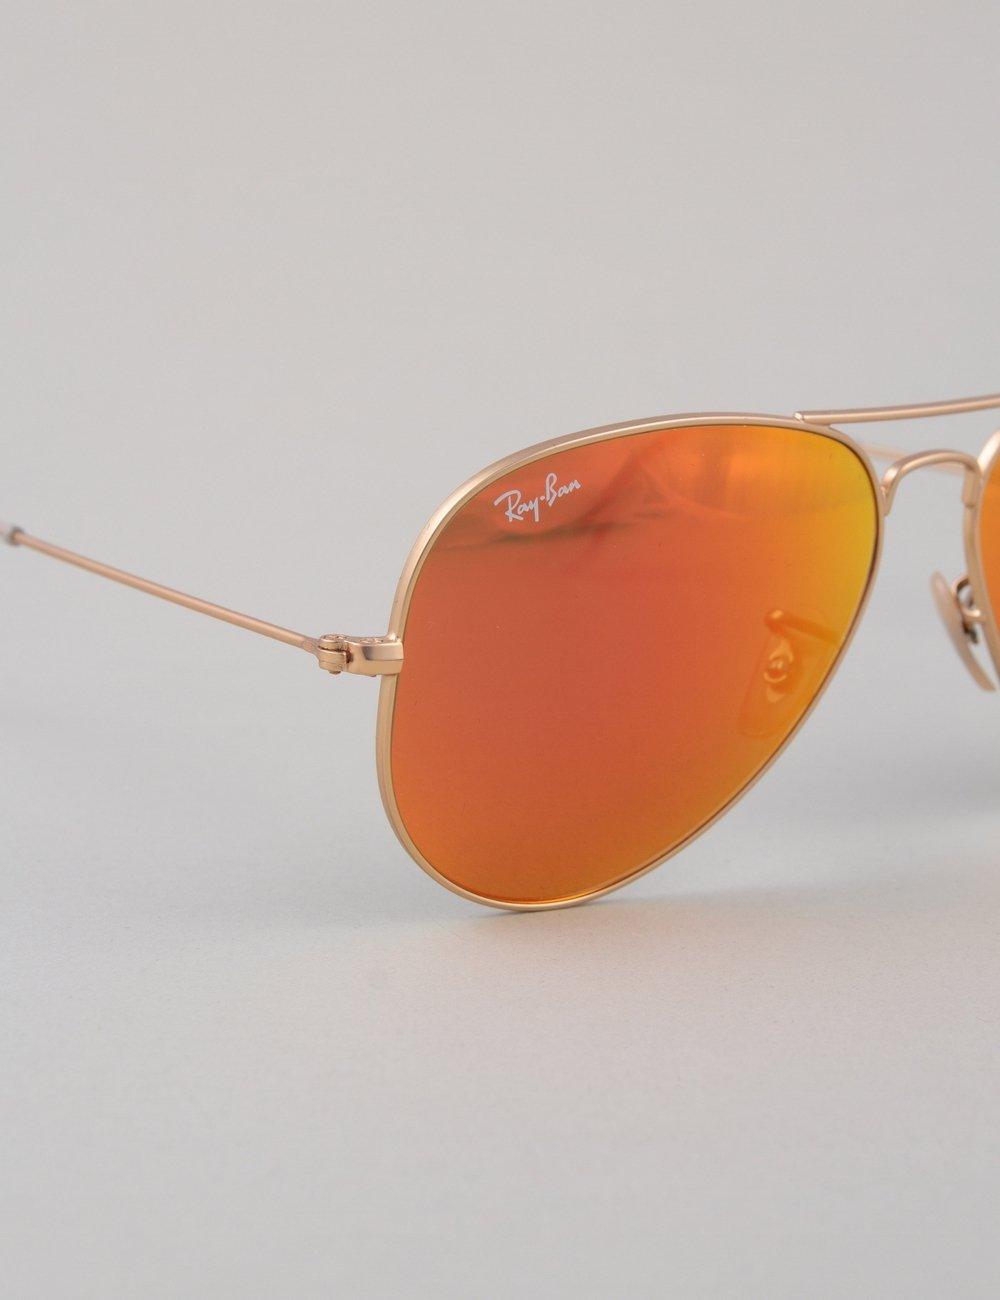 Ray-Ban Aviator Large Sunglasses - Matte Gold | Mirror